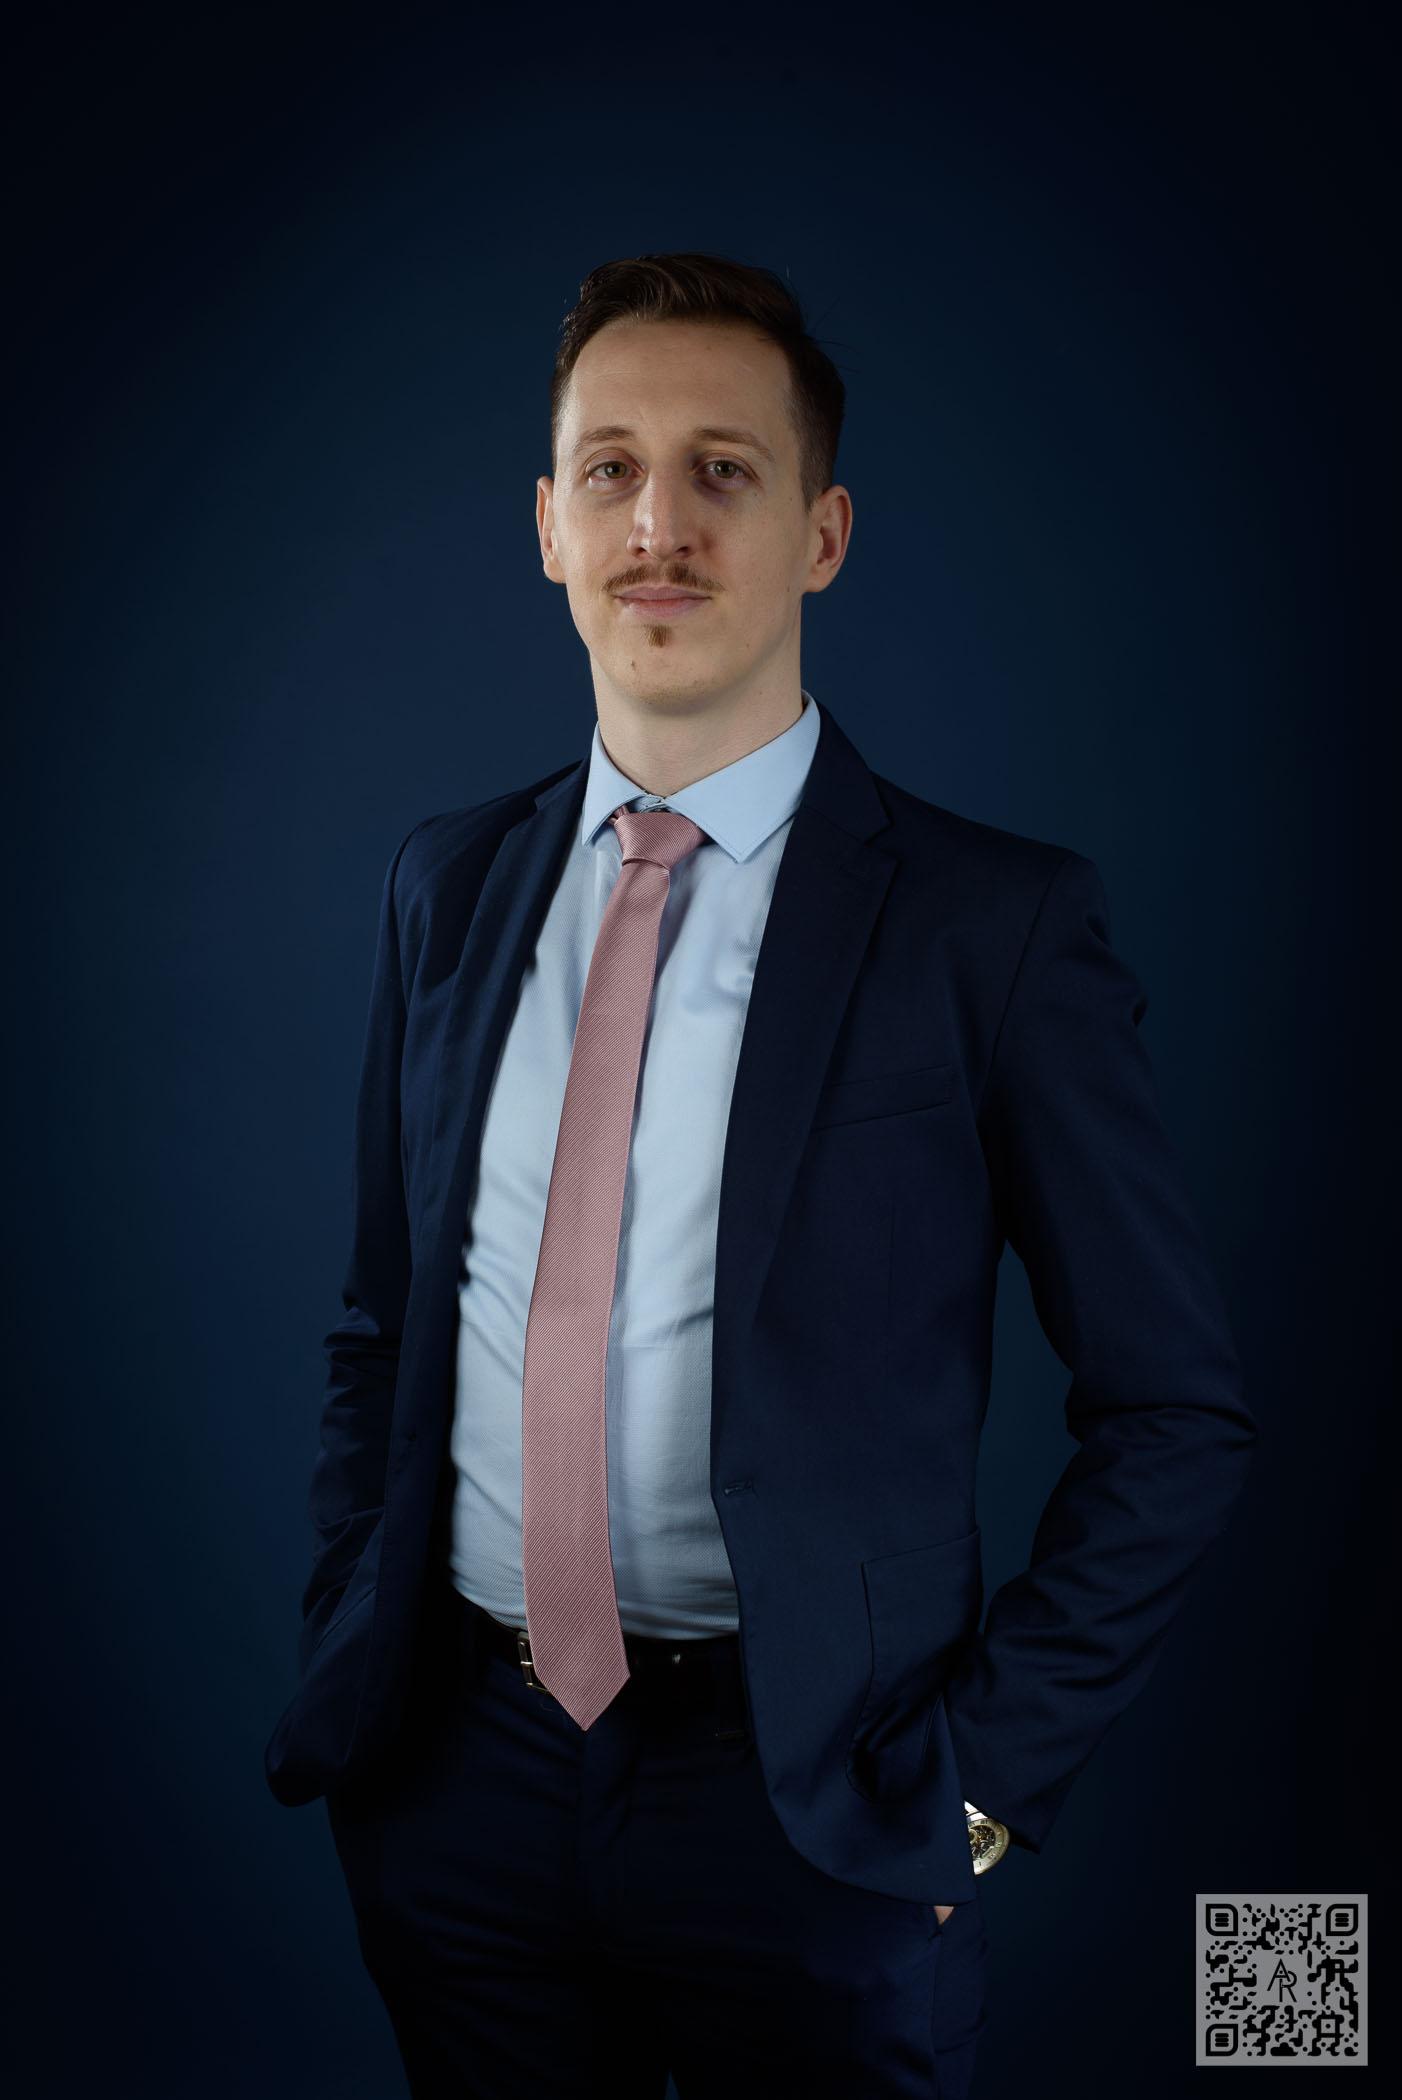 Stefan Bunazioiu – Suit Up